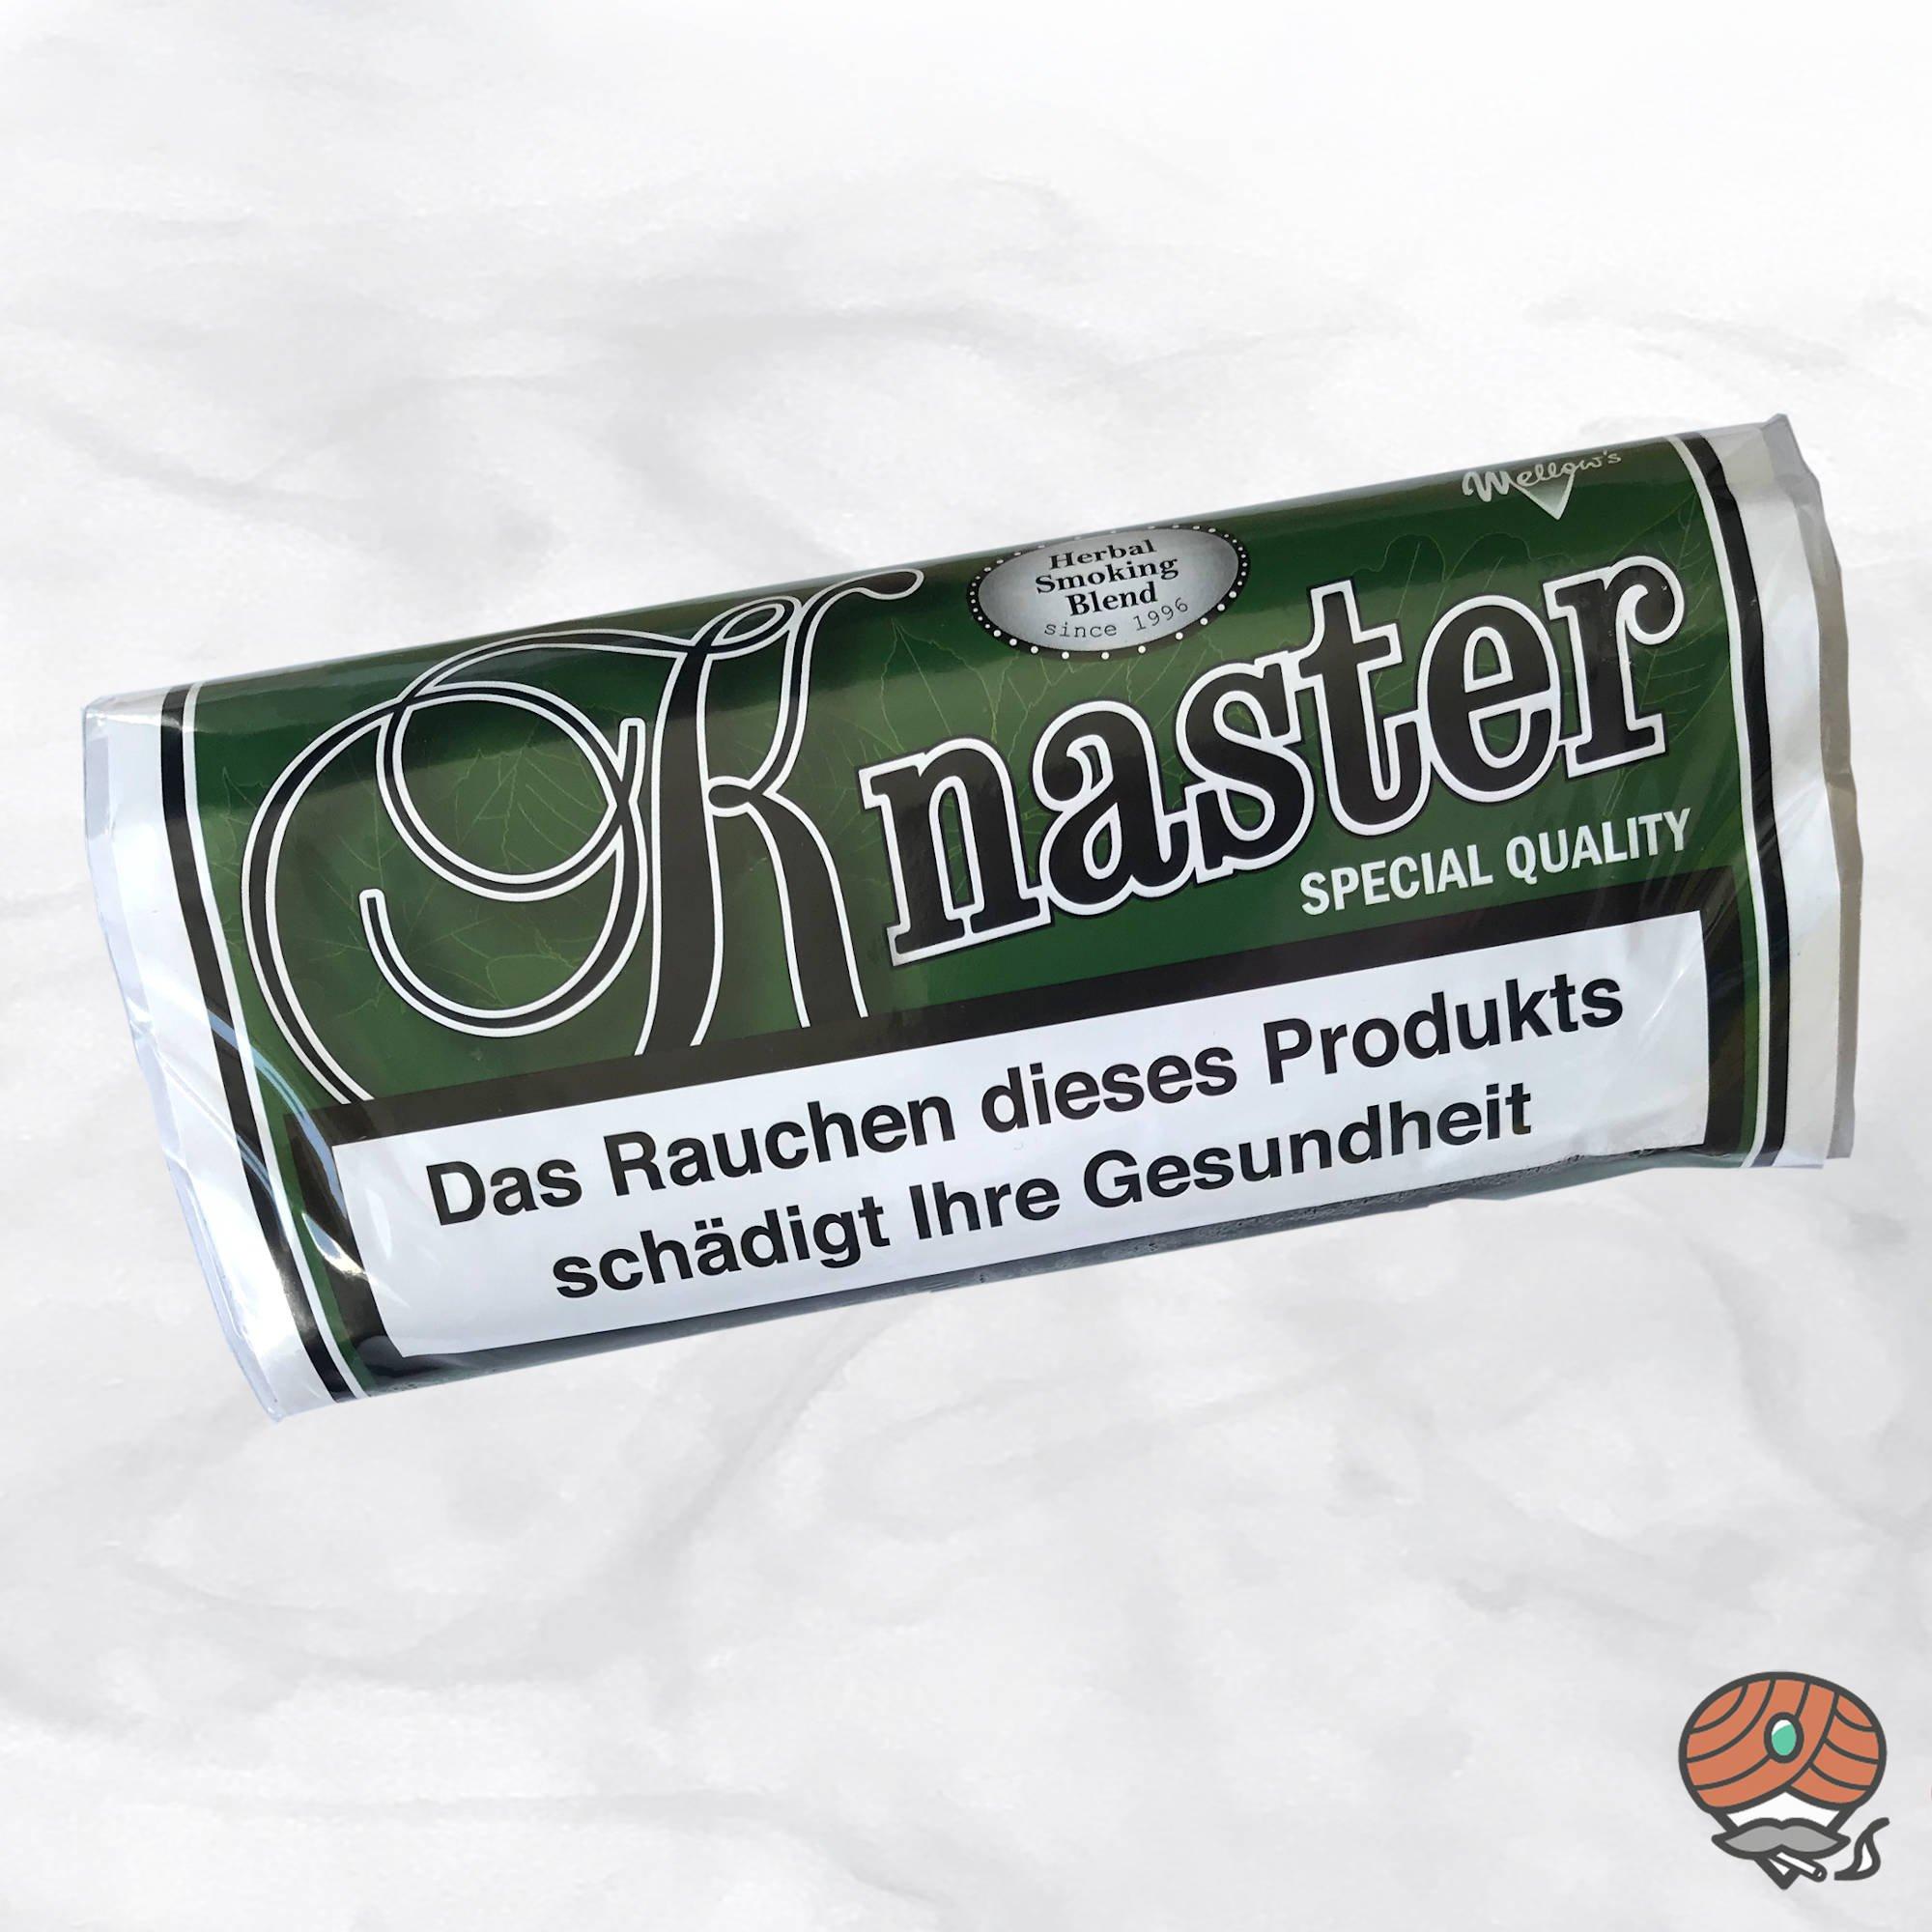 Knaster Special Quality, Tabakersatz, nikotinfrei, Kräutermischung 35g